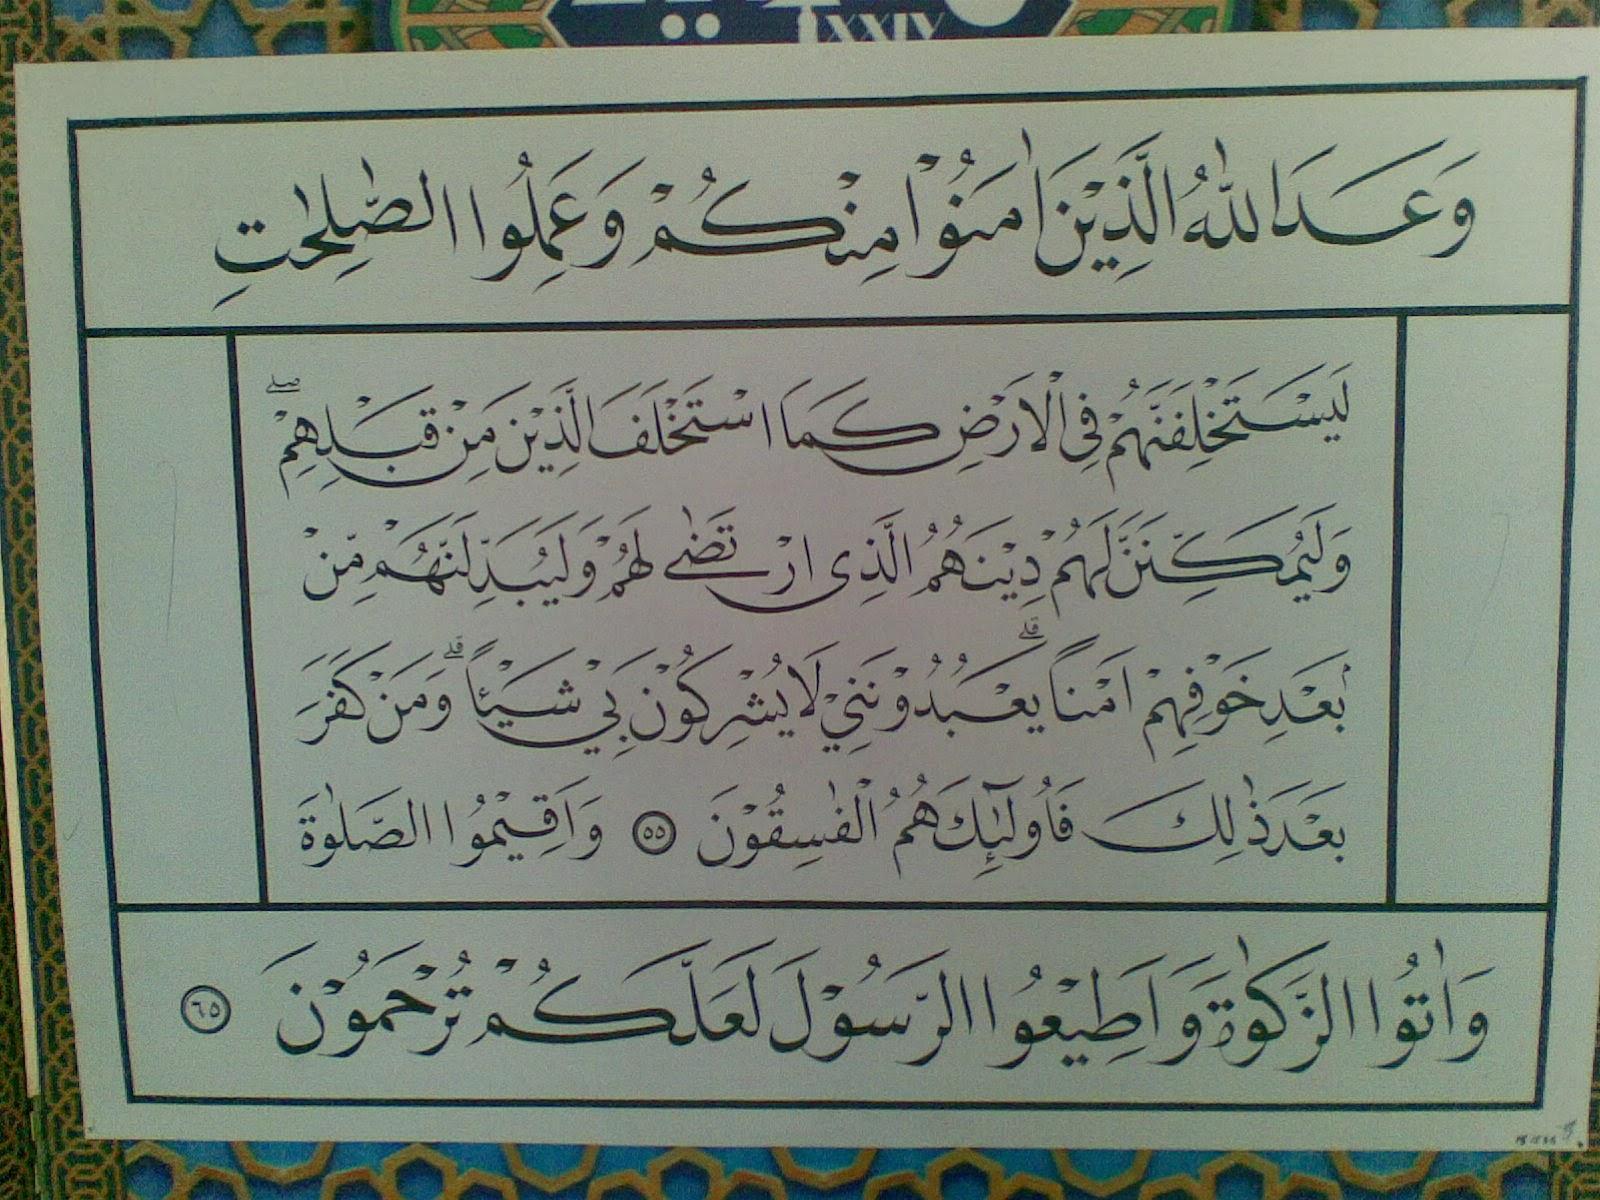 macam macam kaligrafi mushaf